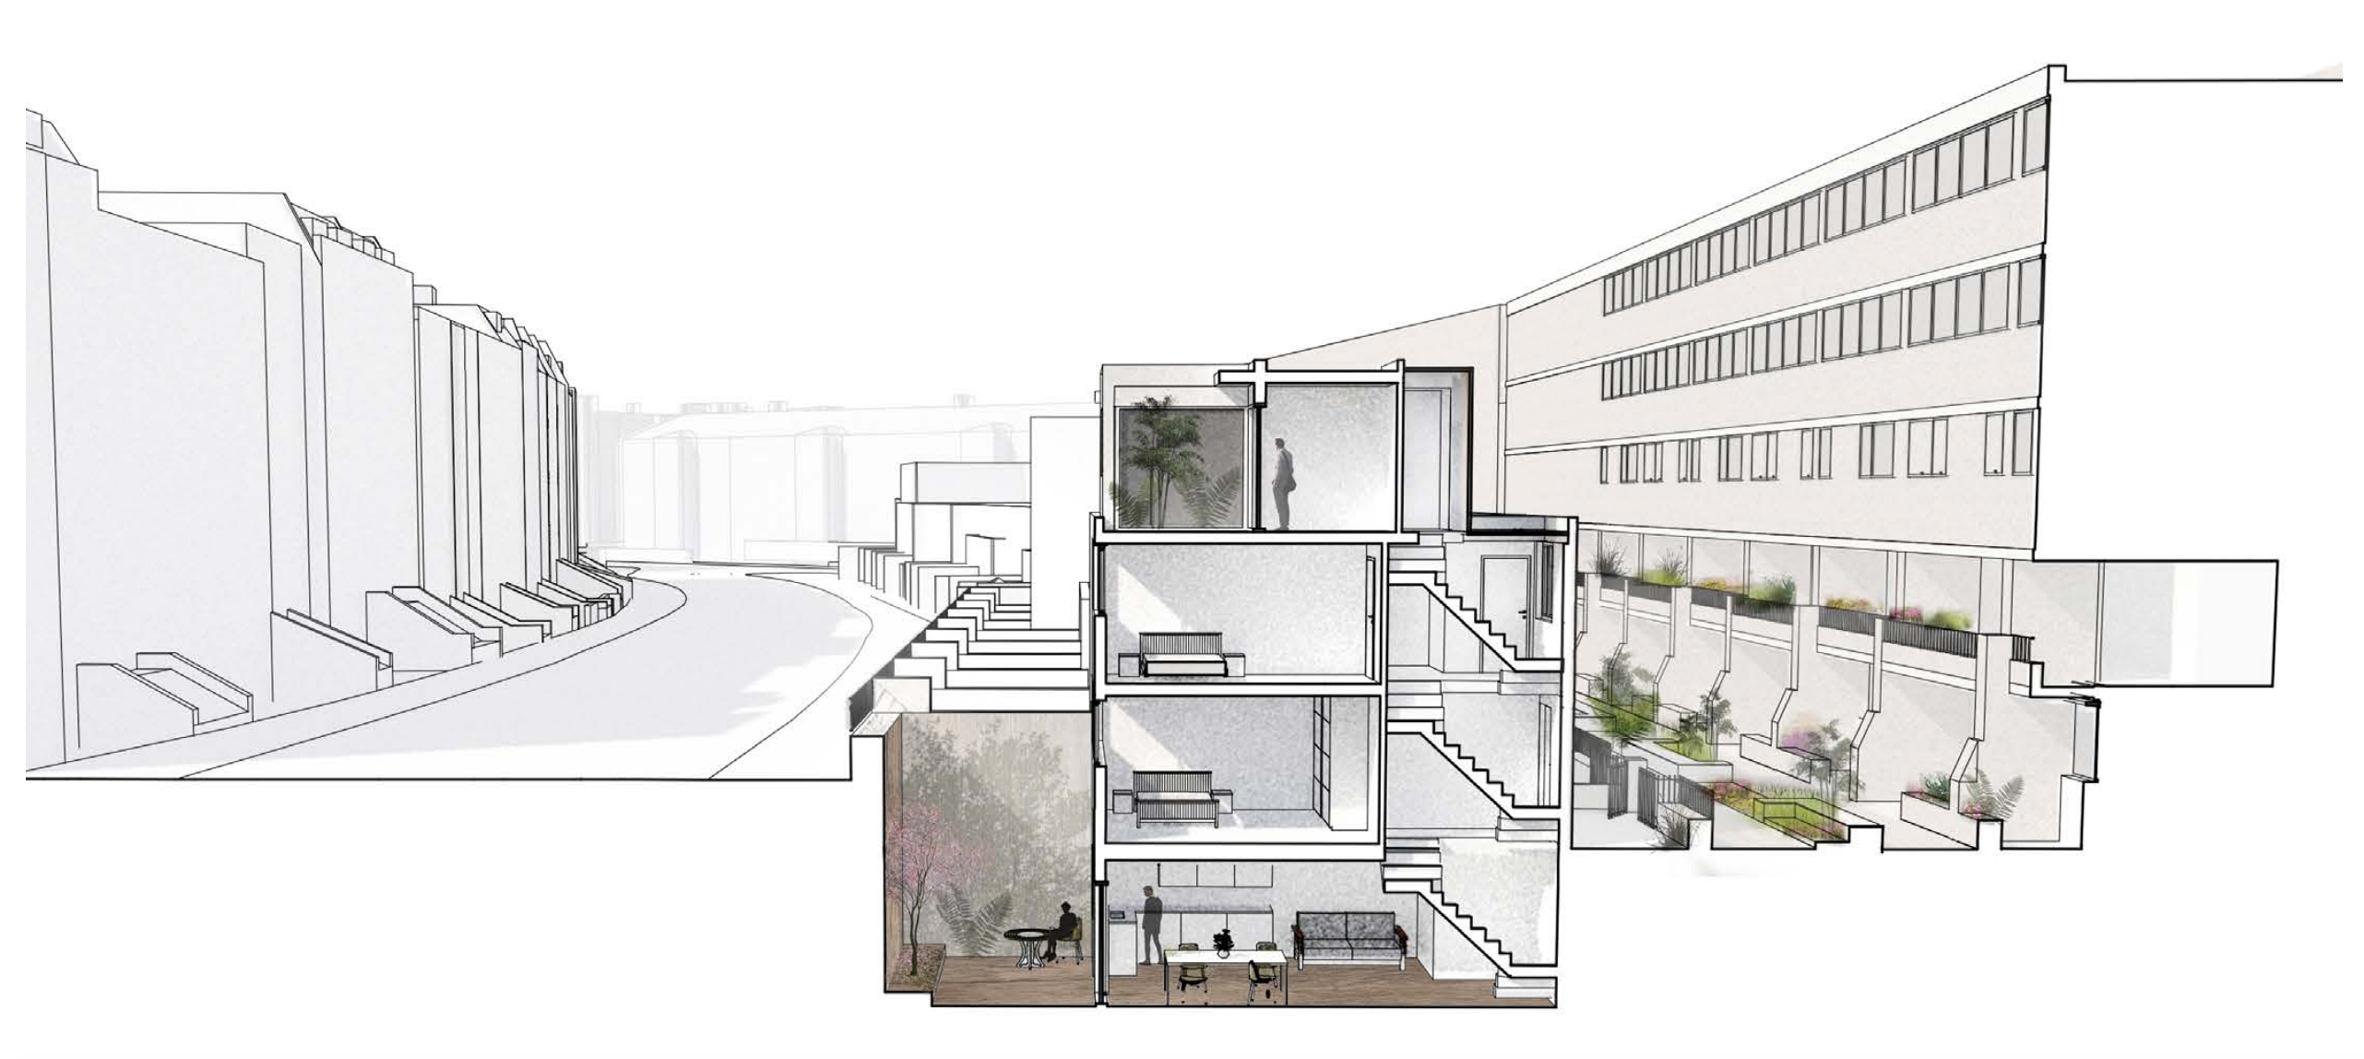 Ideas for Lancaster West Estate regeneration